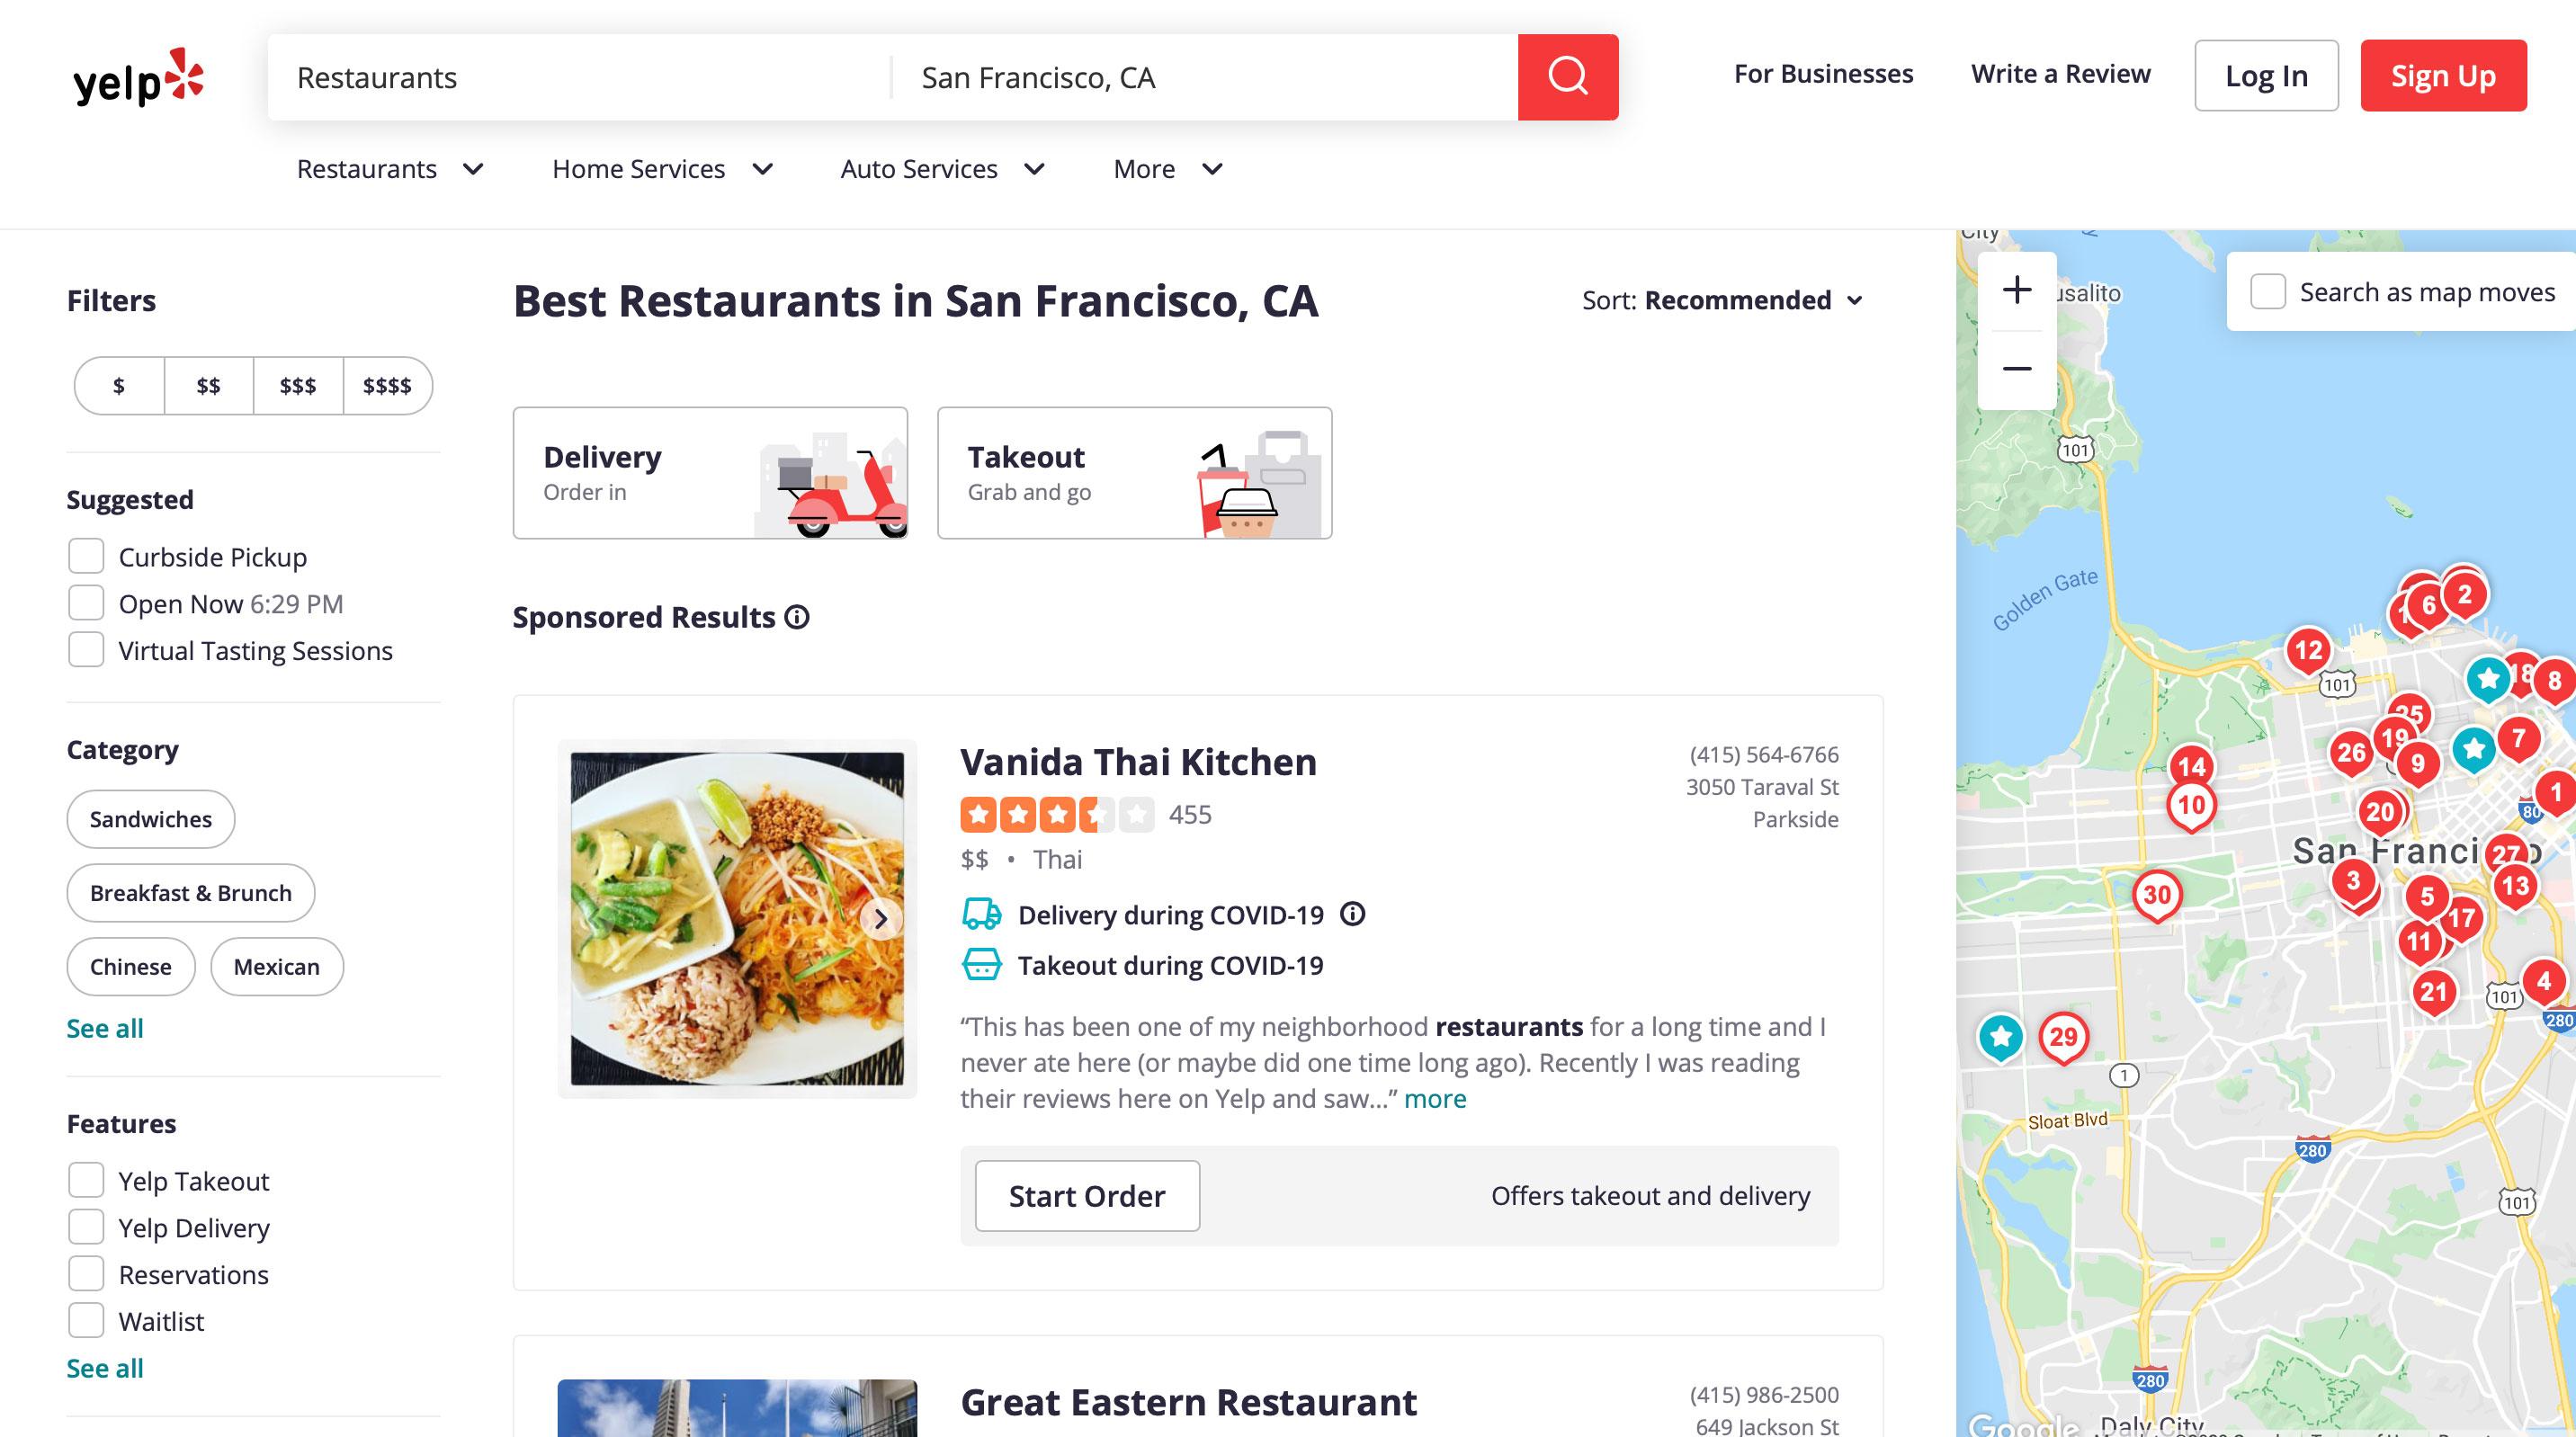 A screenshot of the Yelp homepage